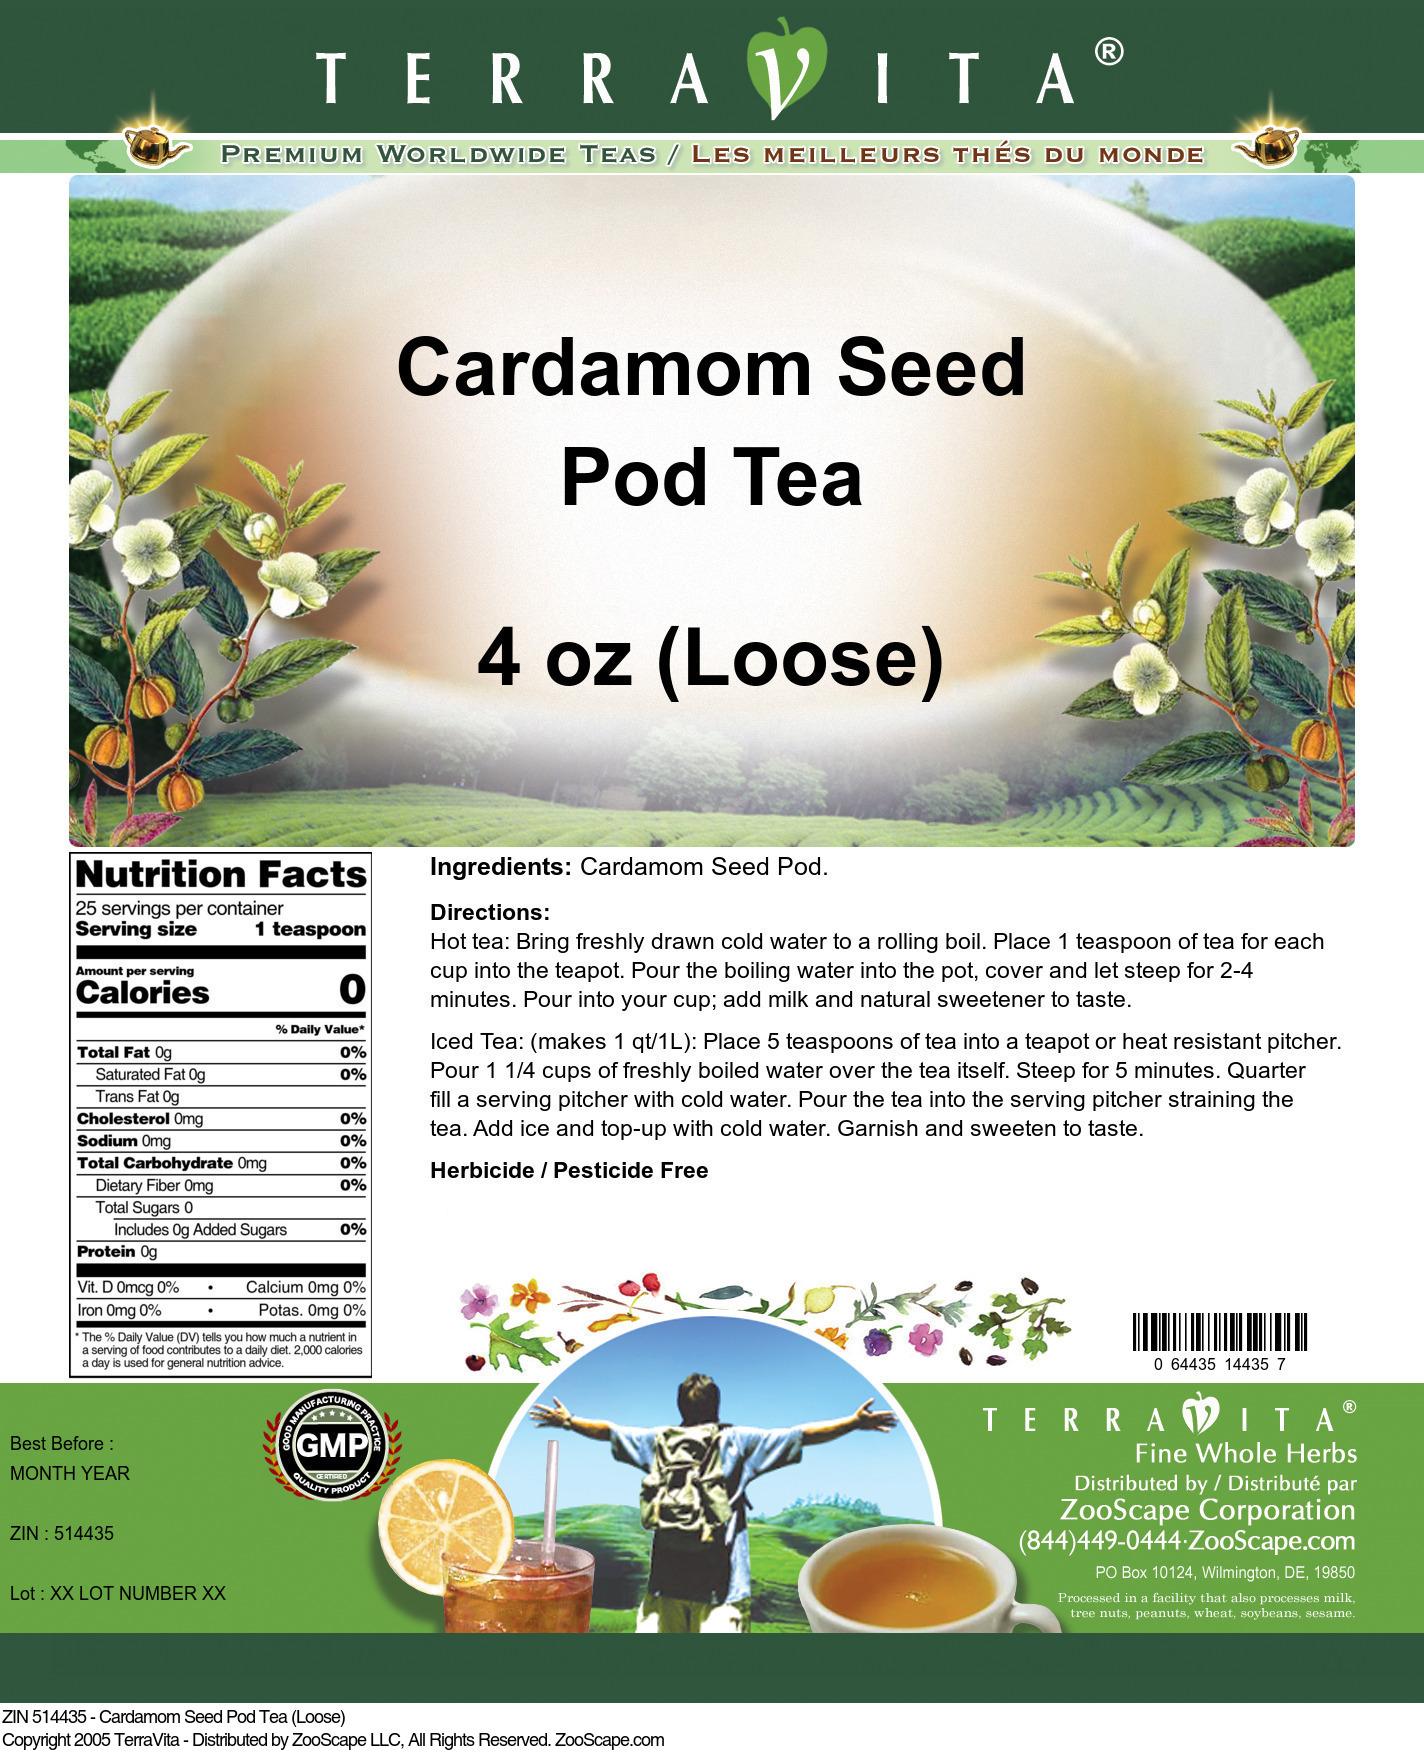 Cardamom Seed Pod Tea (Loose)